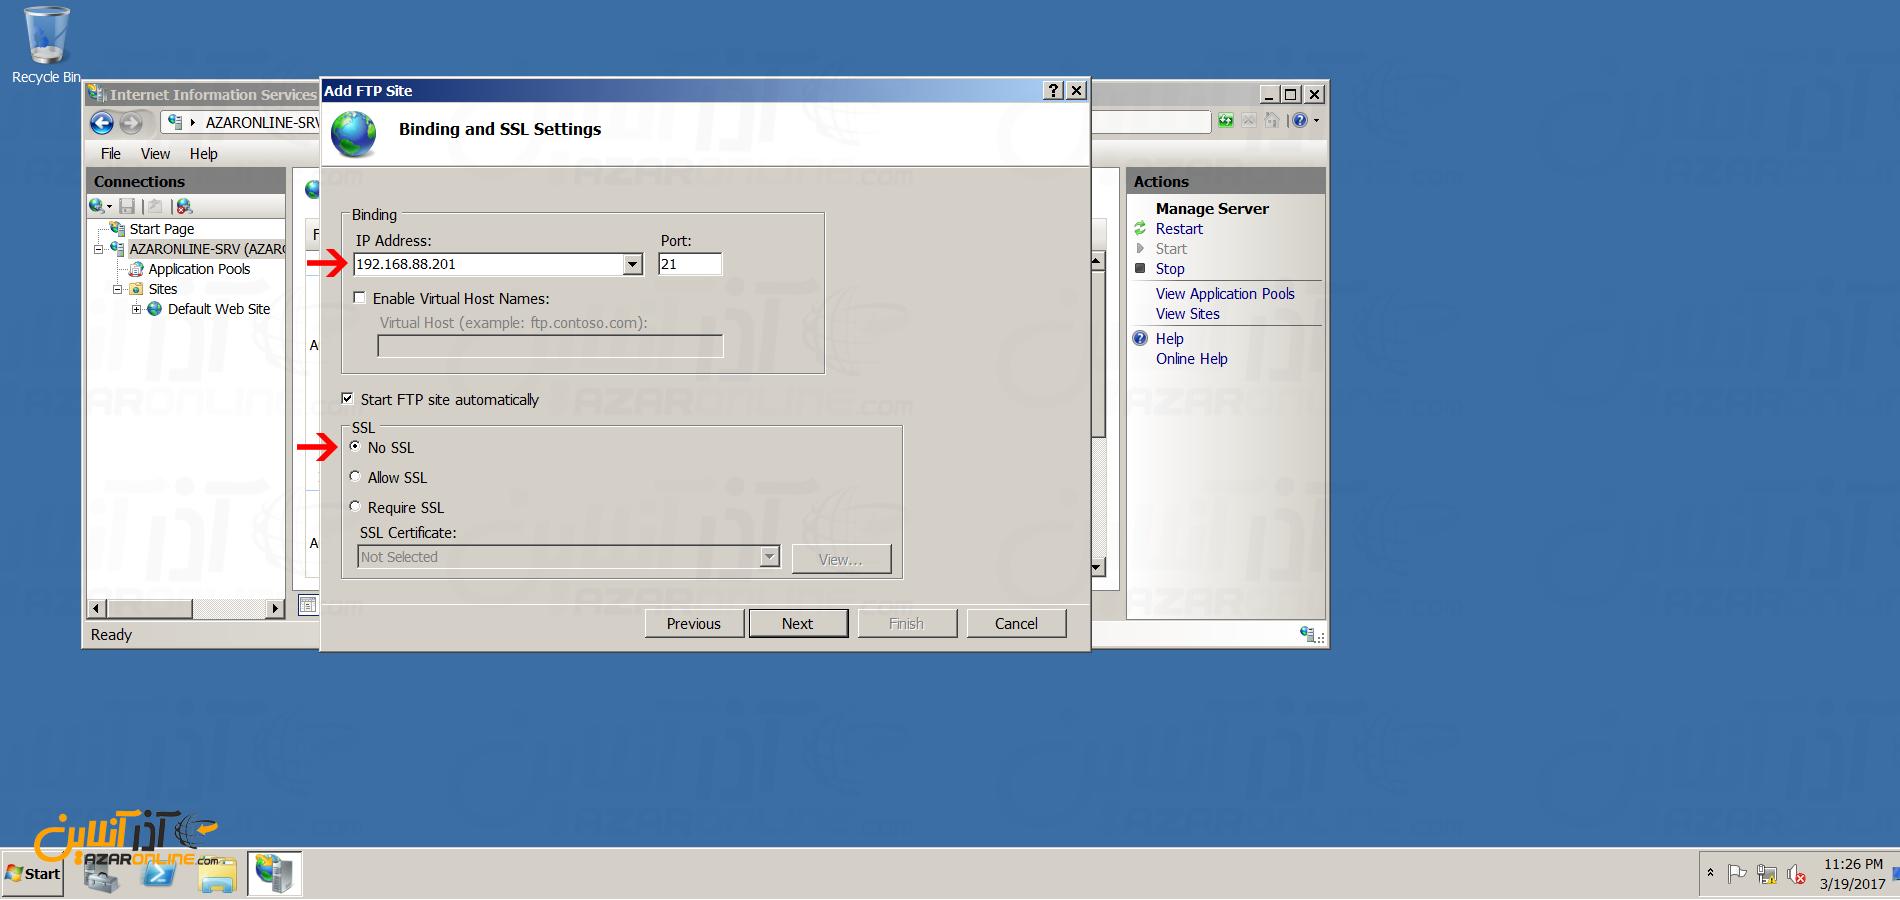 نصب FTP سرور در ویندوز سرور 2008 - انتخاب پورت و آی پی سرور